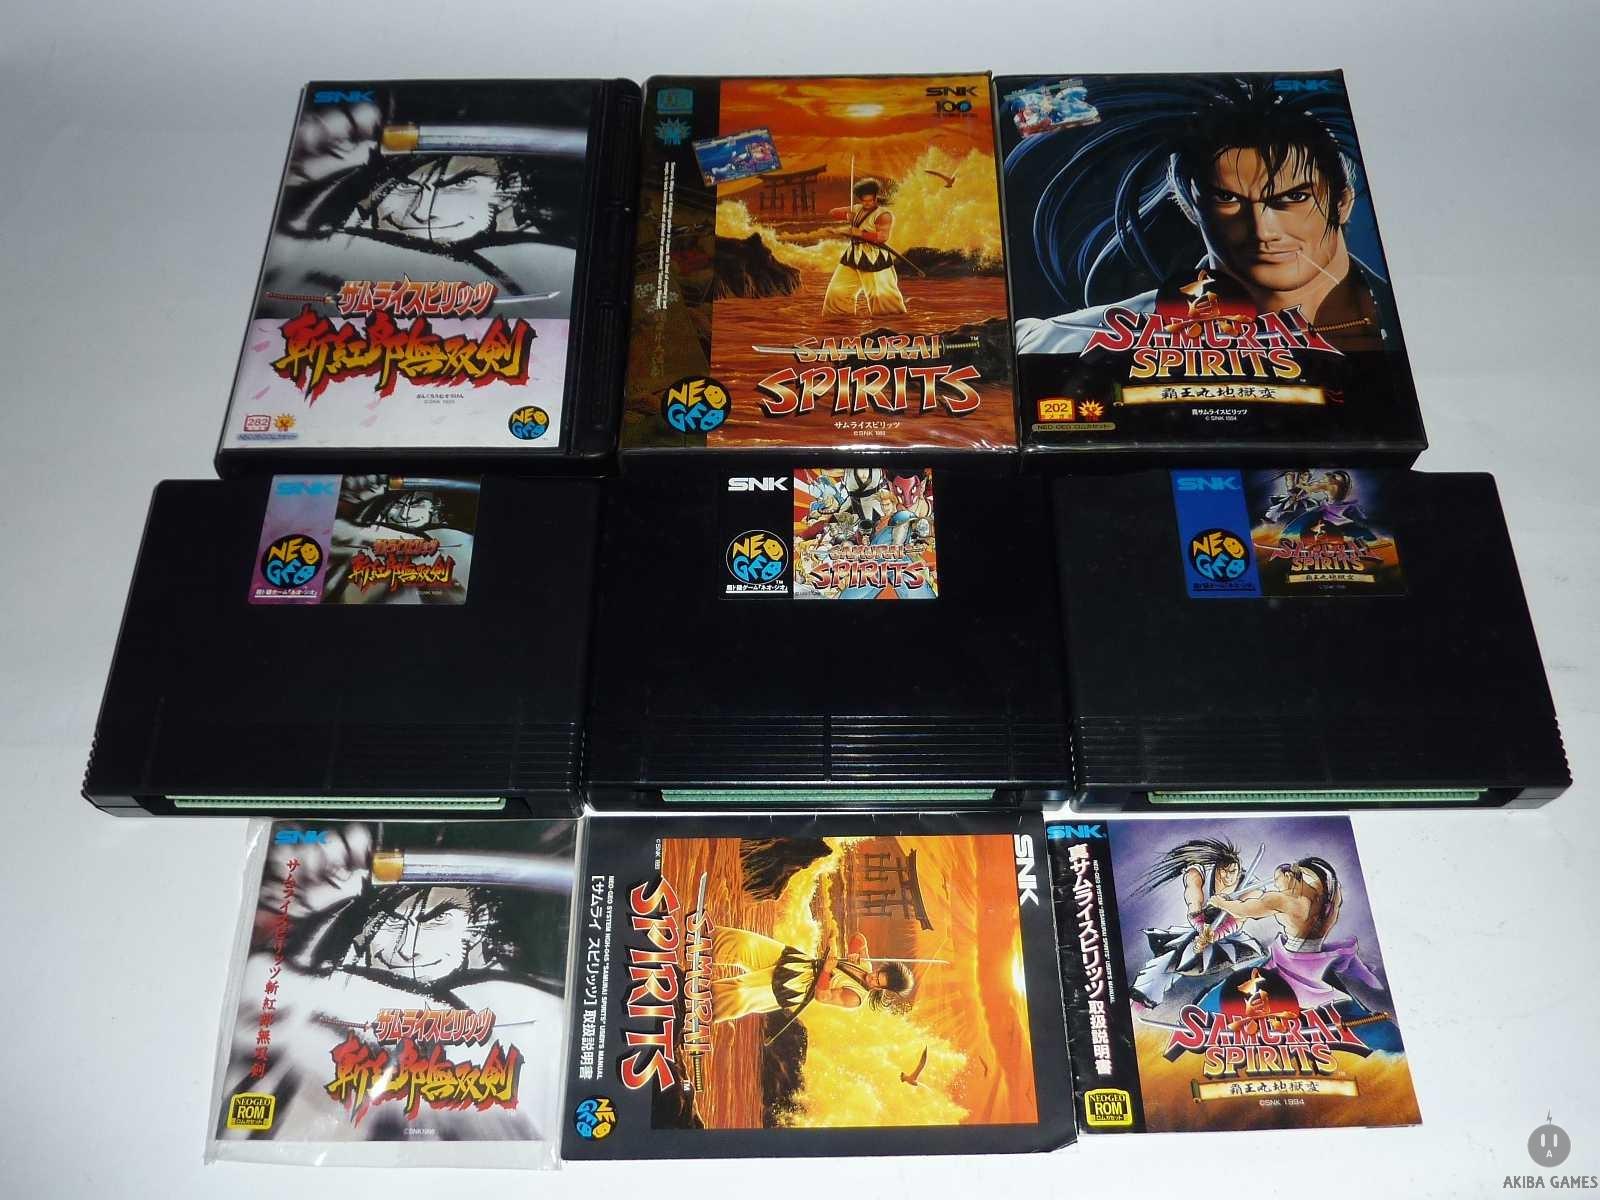 [NG] Samurai Spirits Shodown Series Zankurou Musouken Set of 3